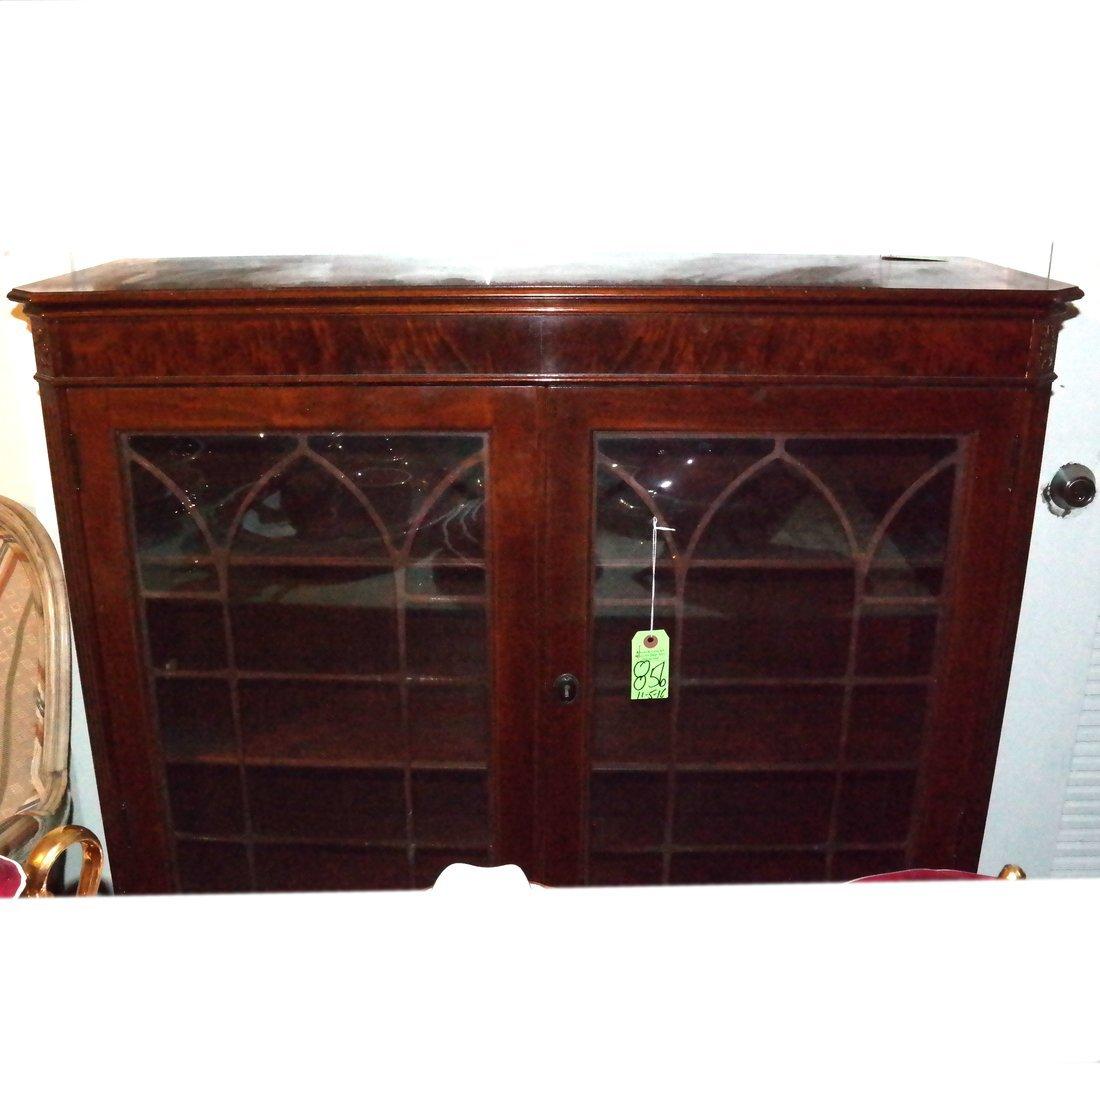 Antique Mahogany Bookcase - 2